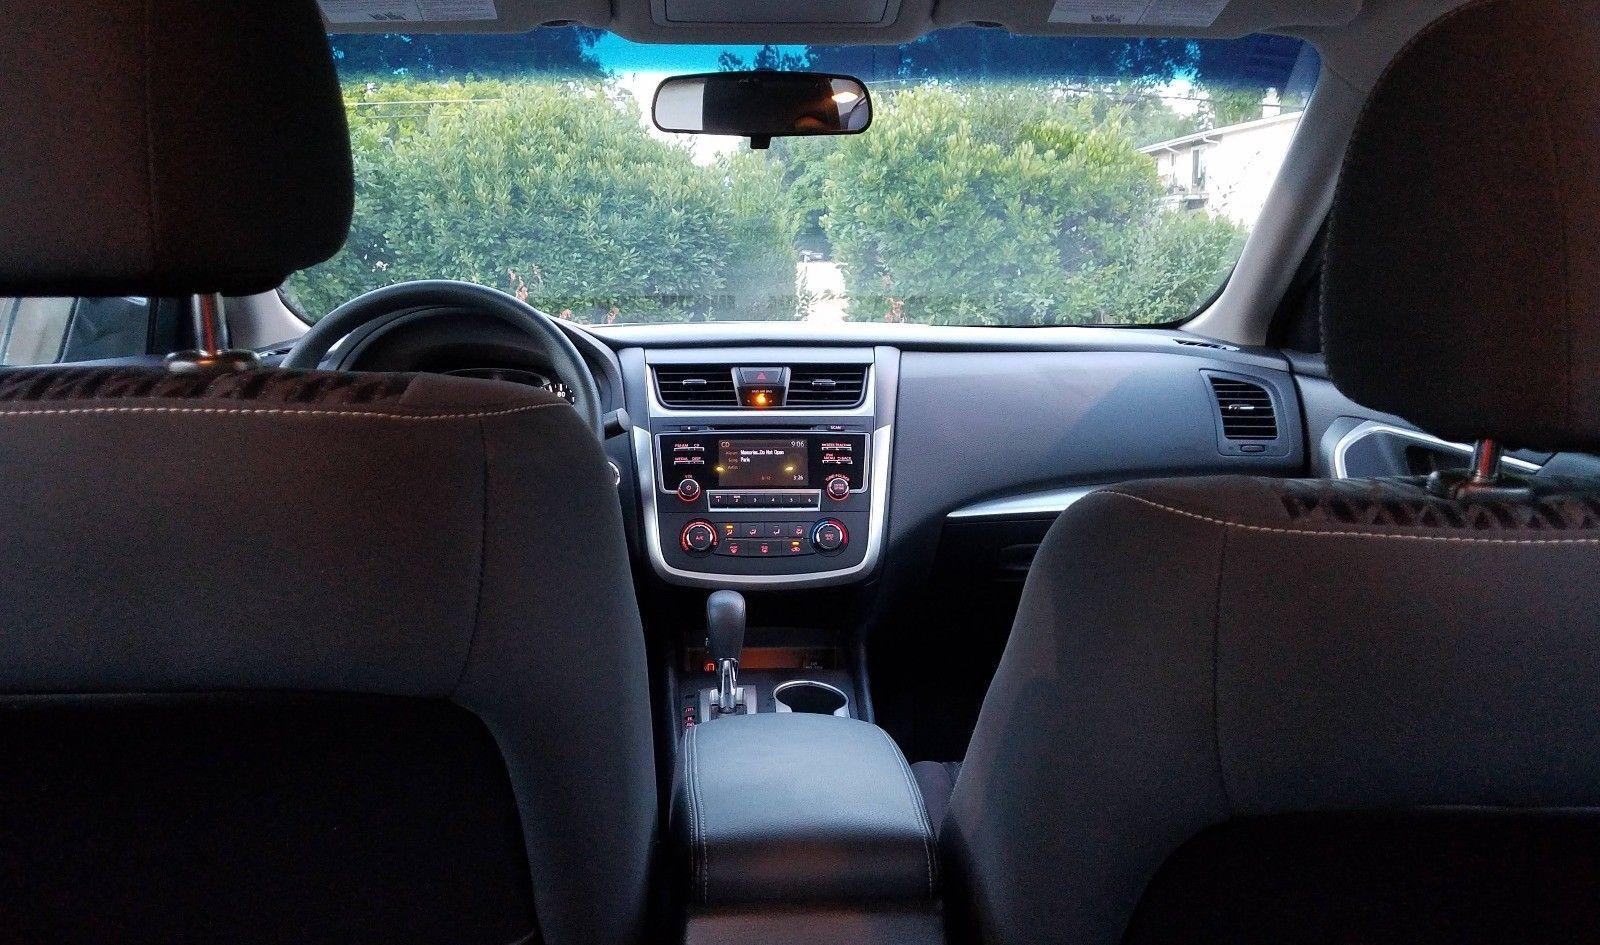 2017 Nissan Altima Like New